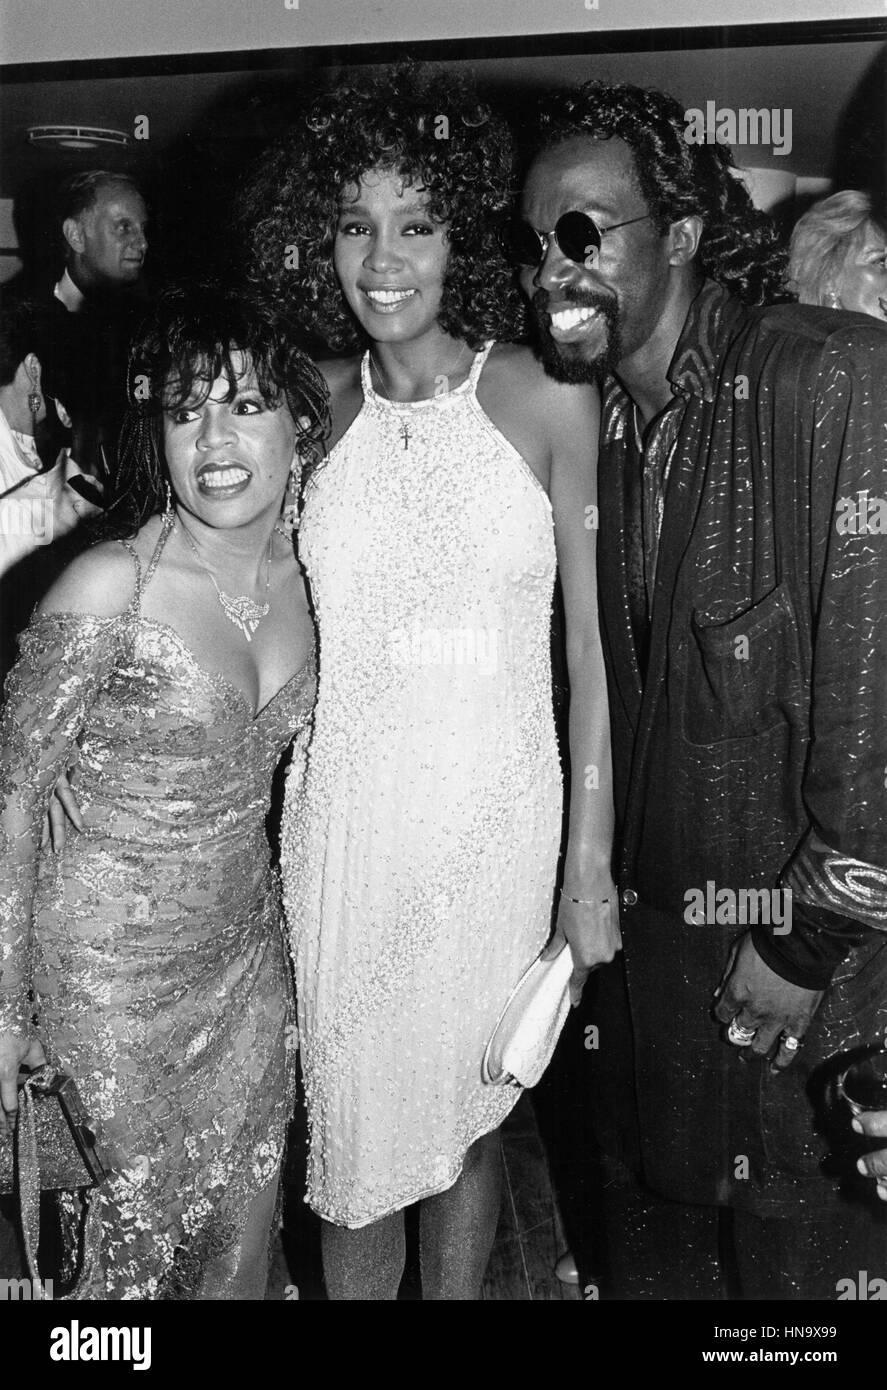 Whitney Houston, Valerie Simpson, & Nickolas Ashford toast to the opening of Ashford & Simpson's new - Stock Image